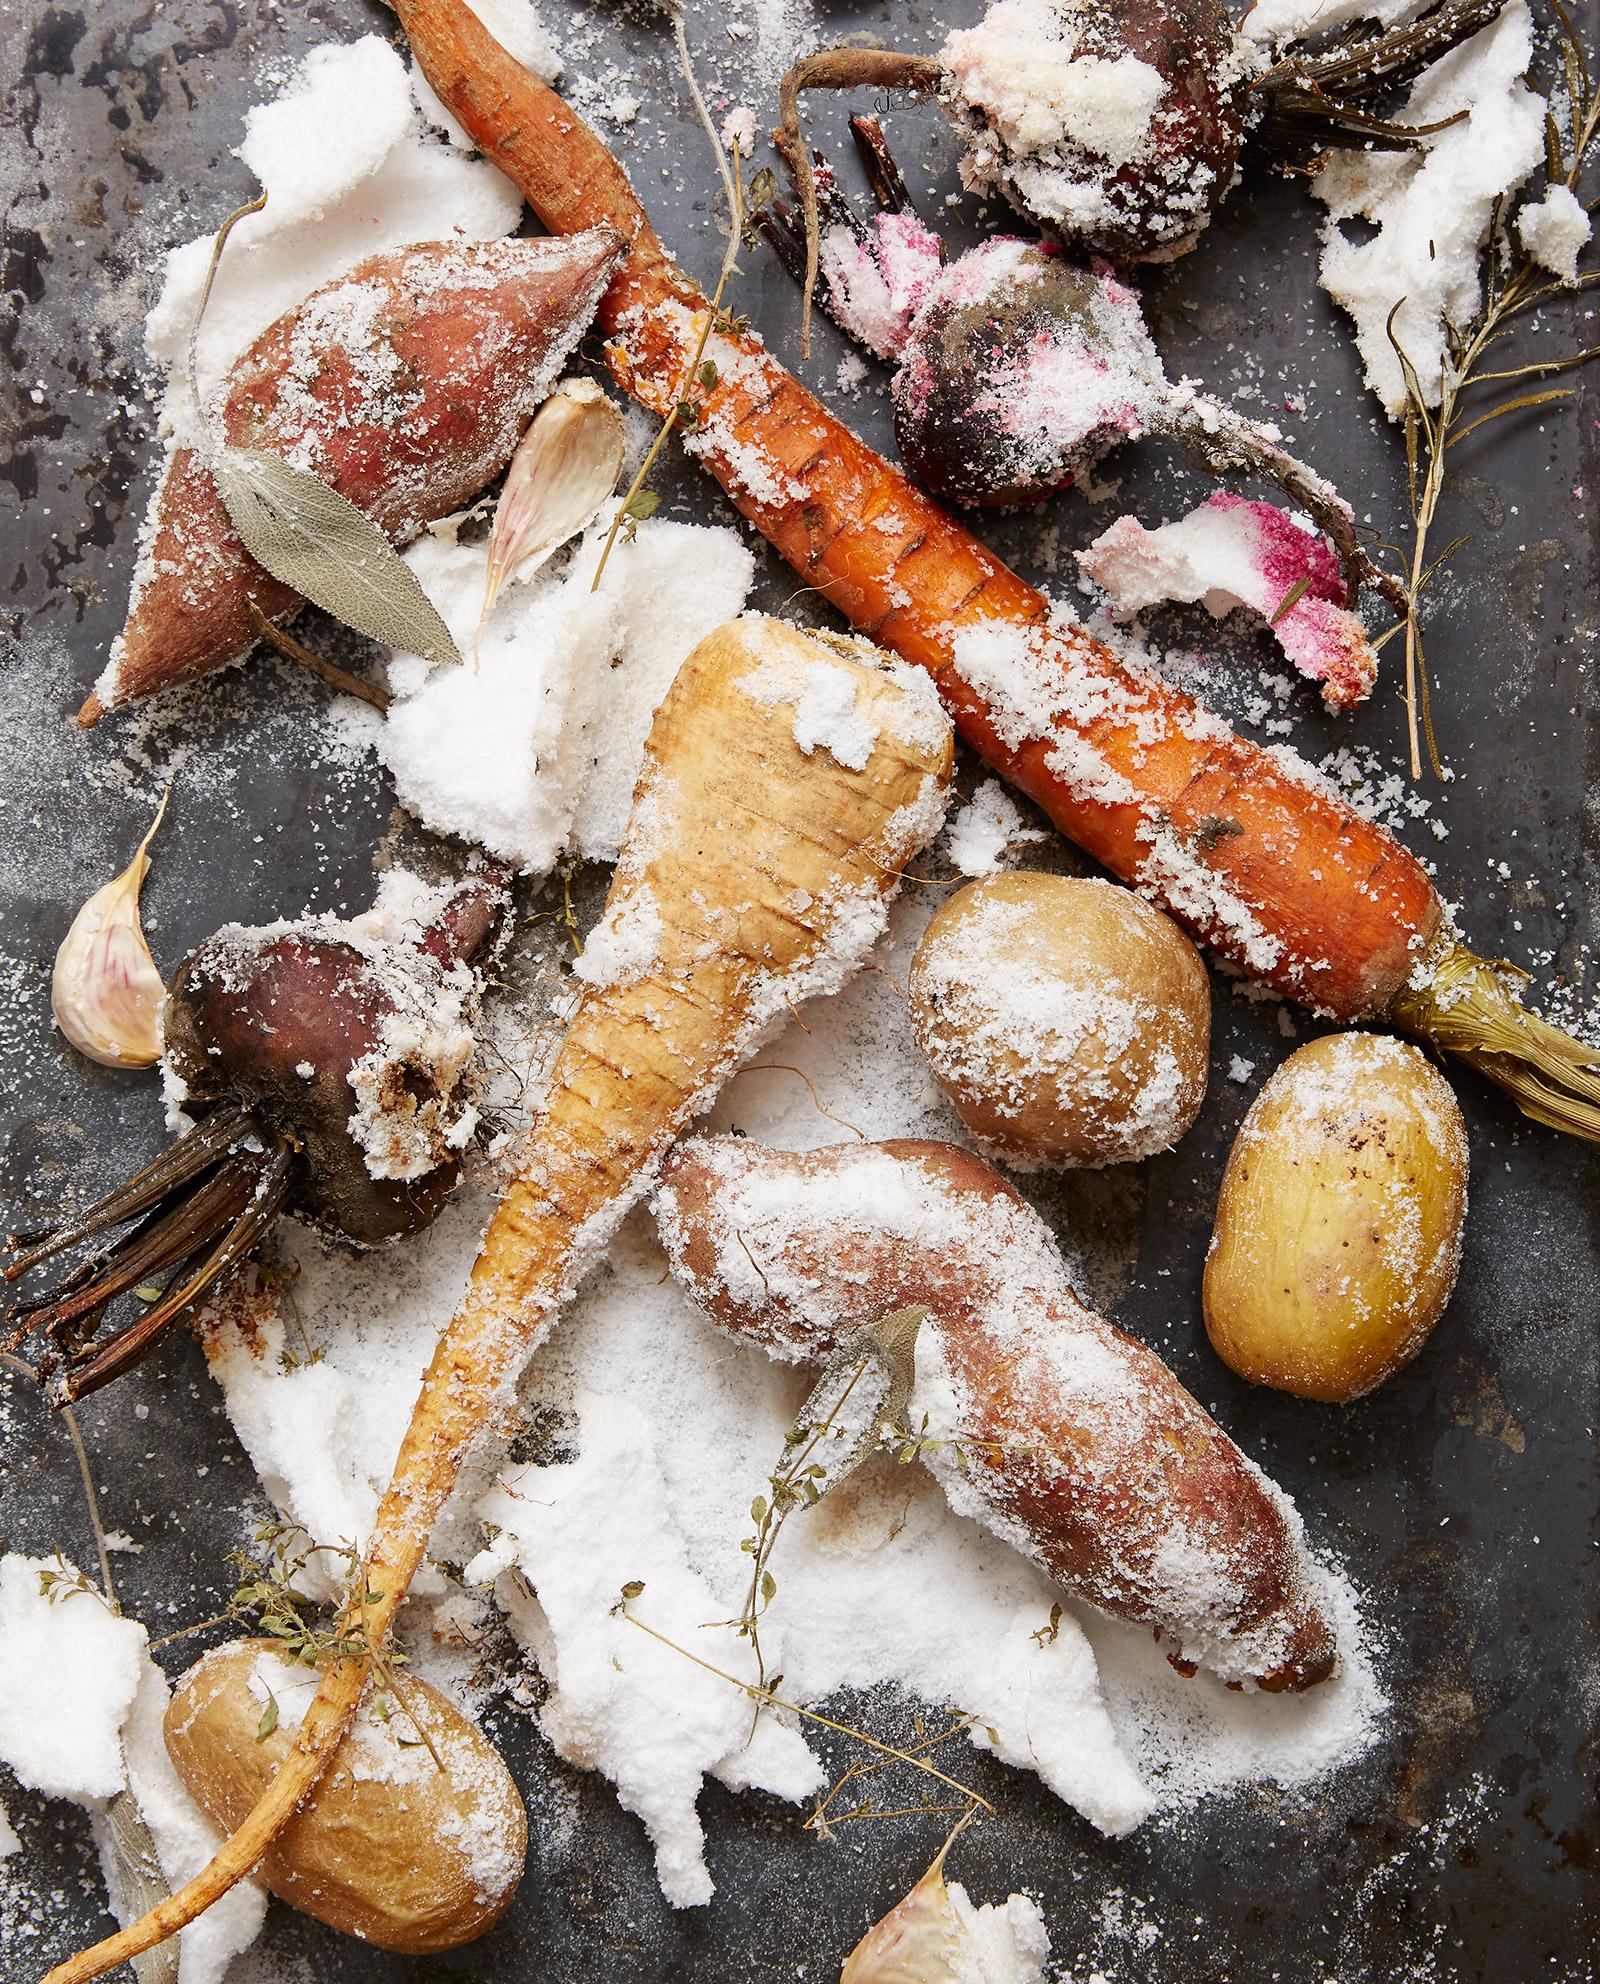 salt roasted beets potatoes carrots parsley root on sheet tray